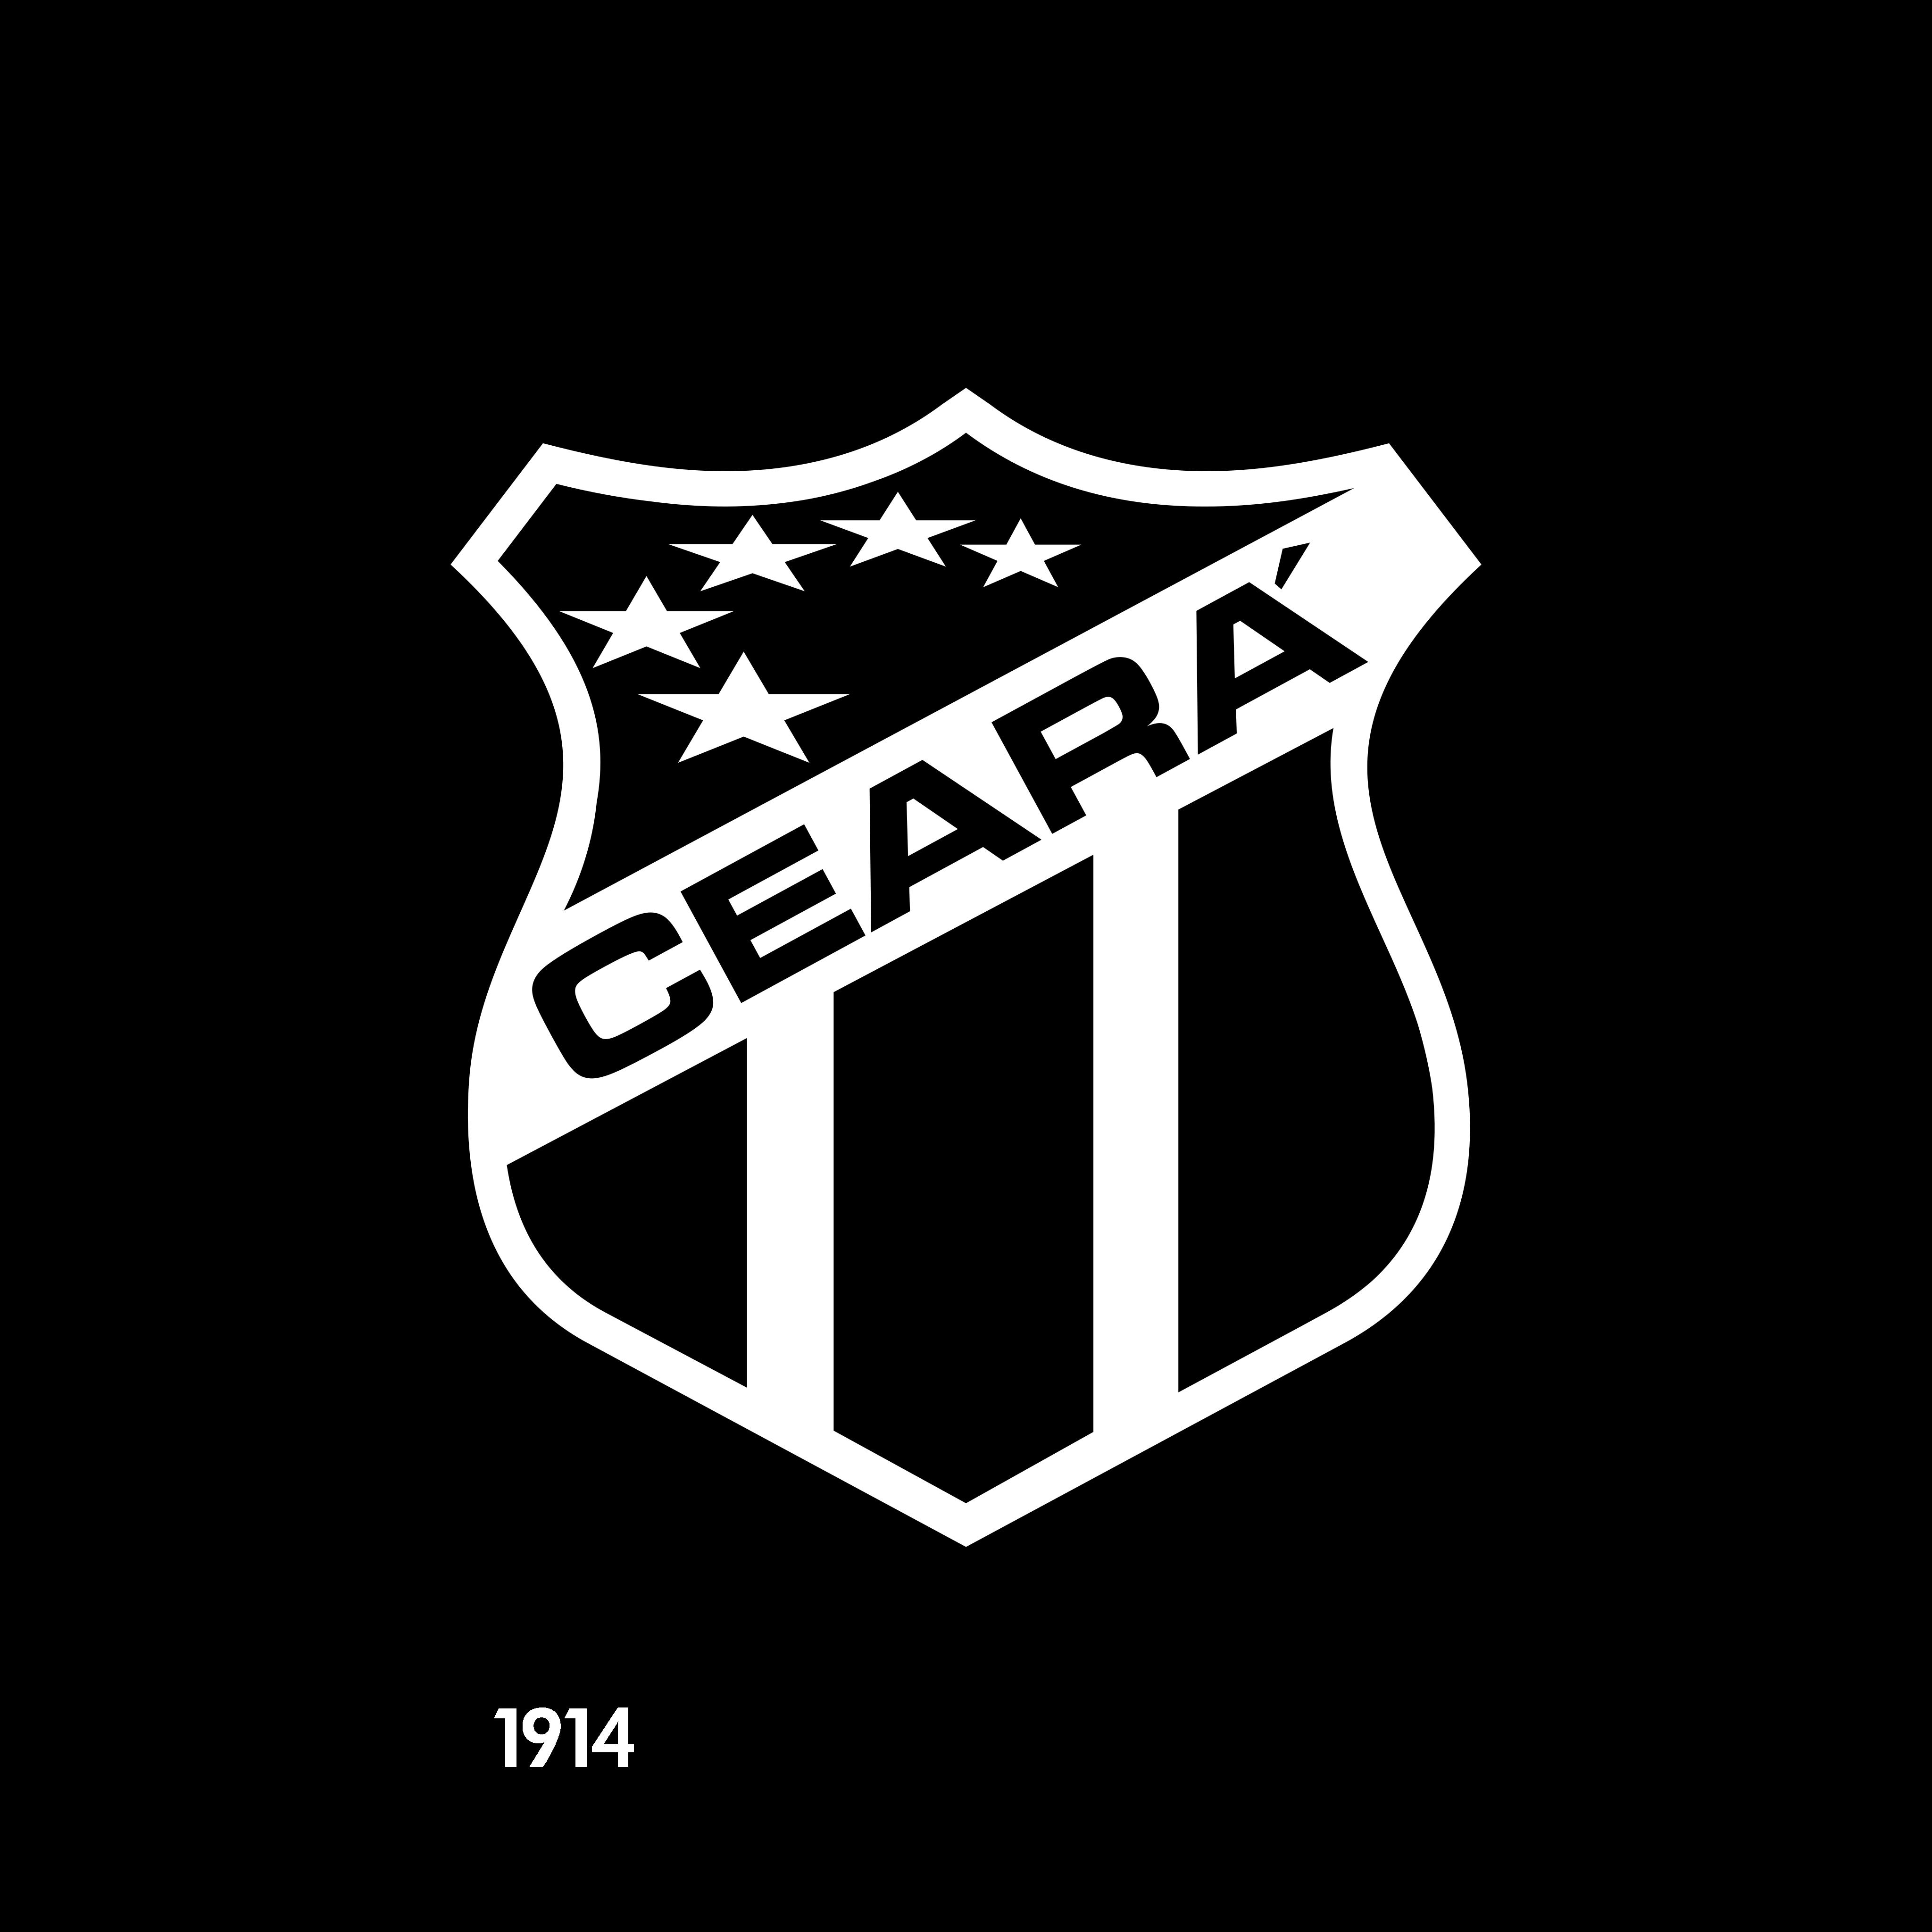 ceara logo 0 - Ceará SC Logo